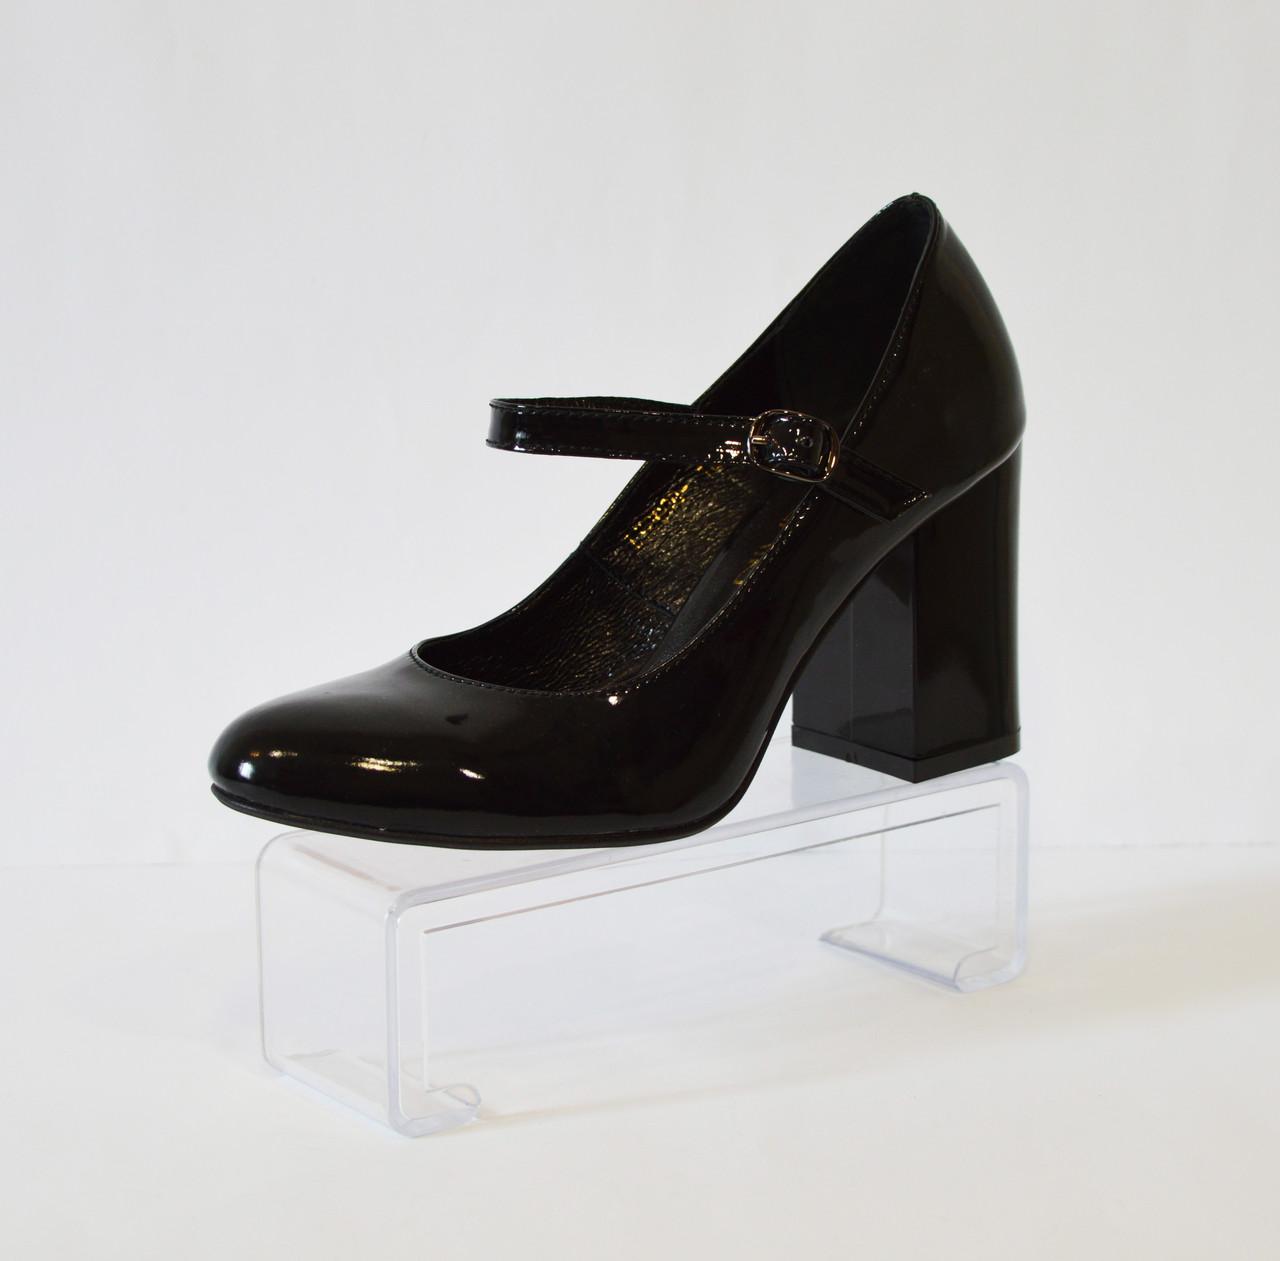 Летние женские туфли Nivelle 1765